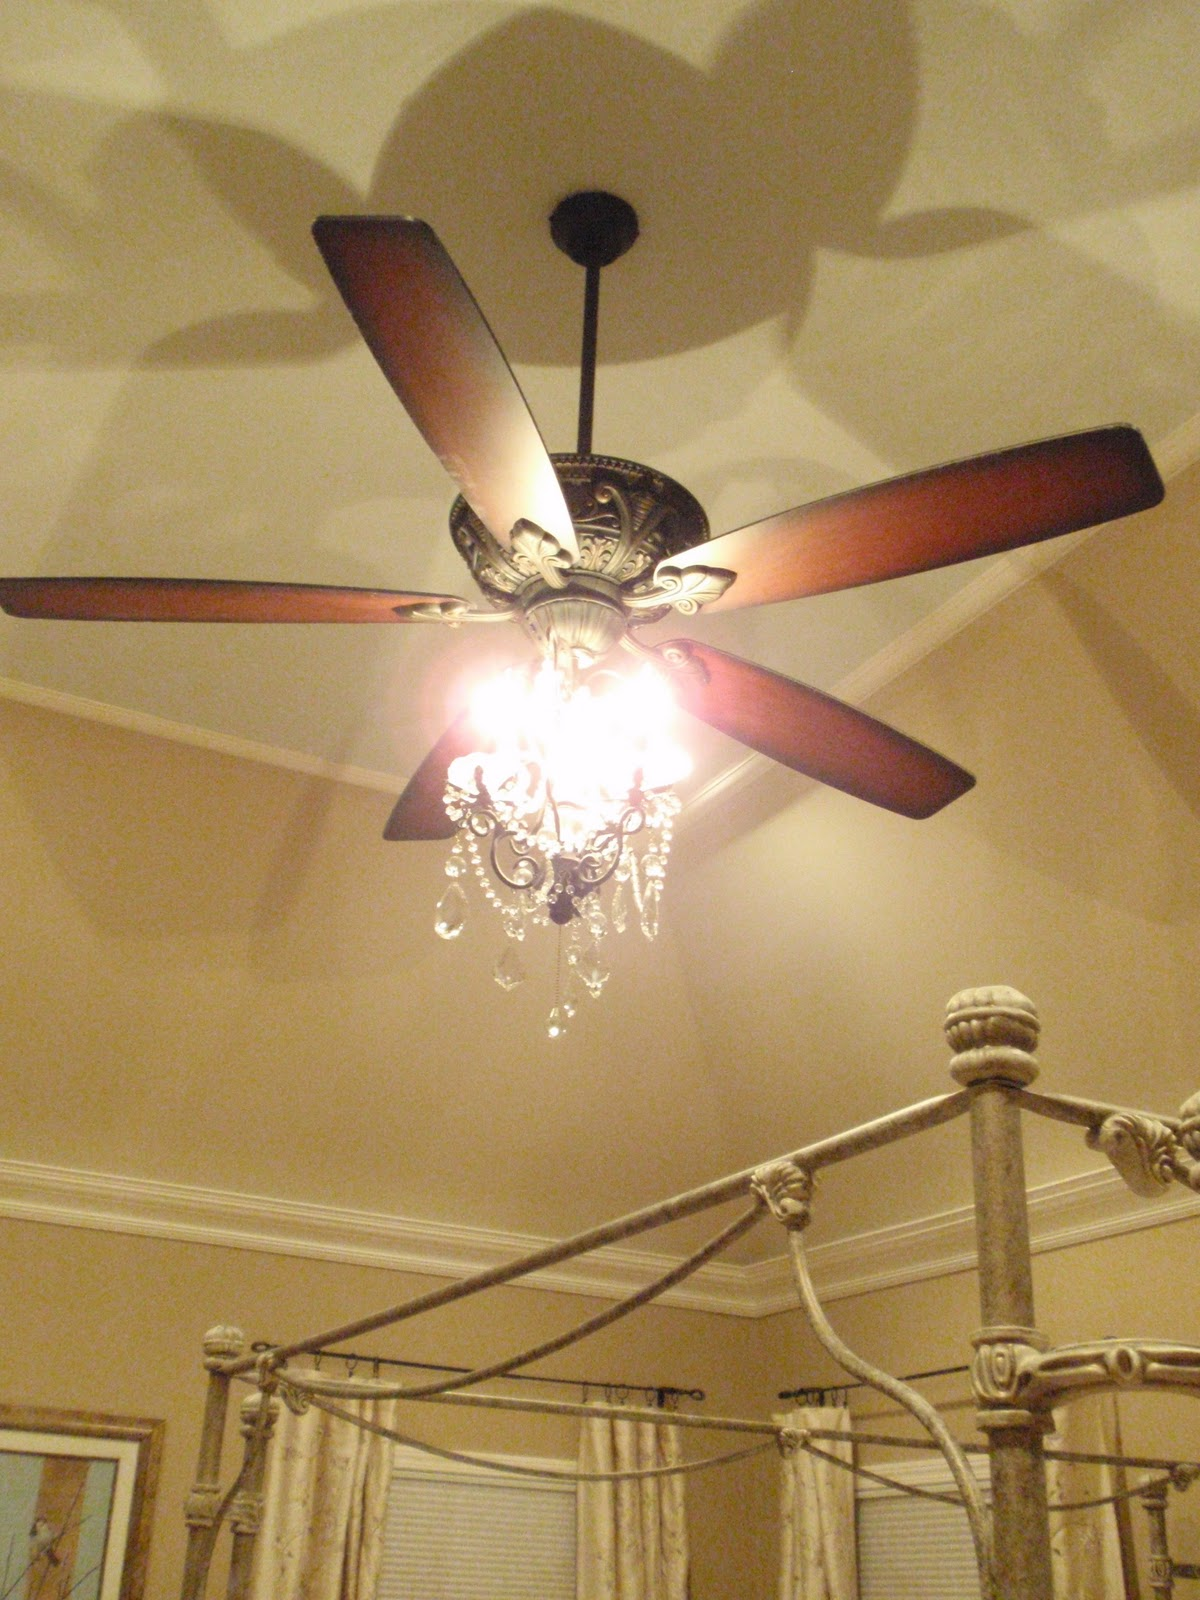 DIY by Design: My Favorite Lighting - A Chandelier